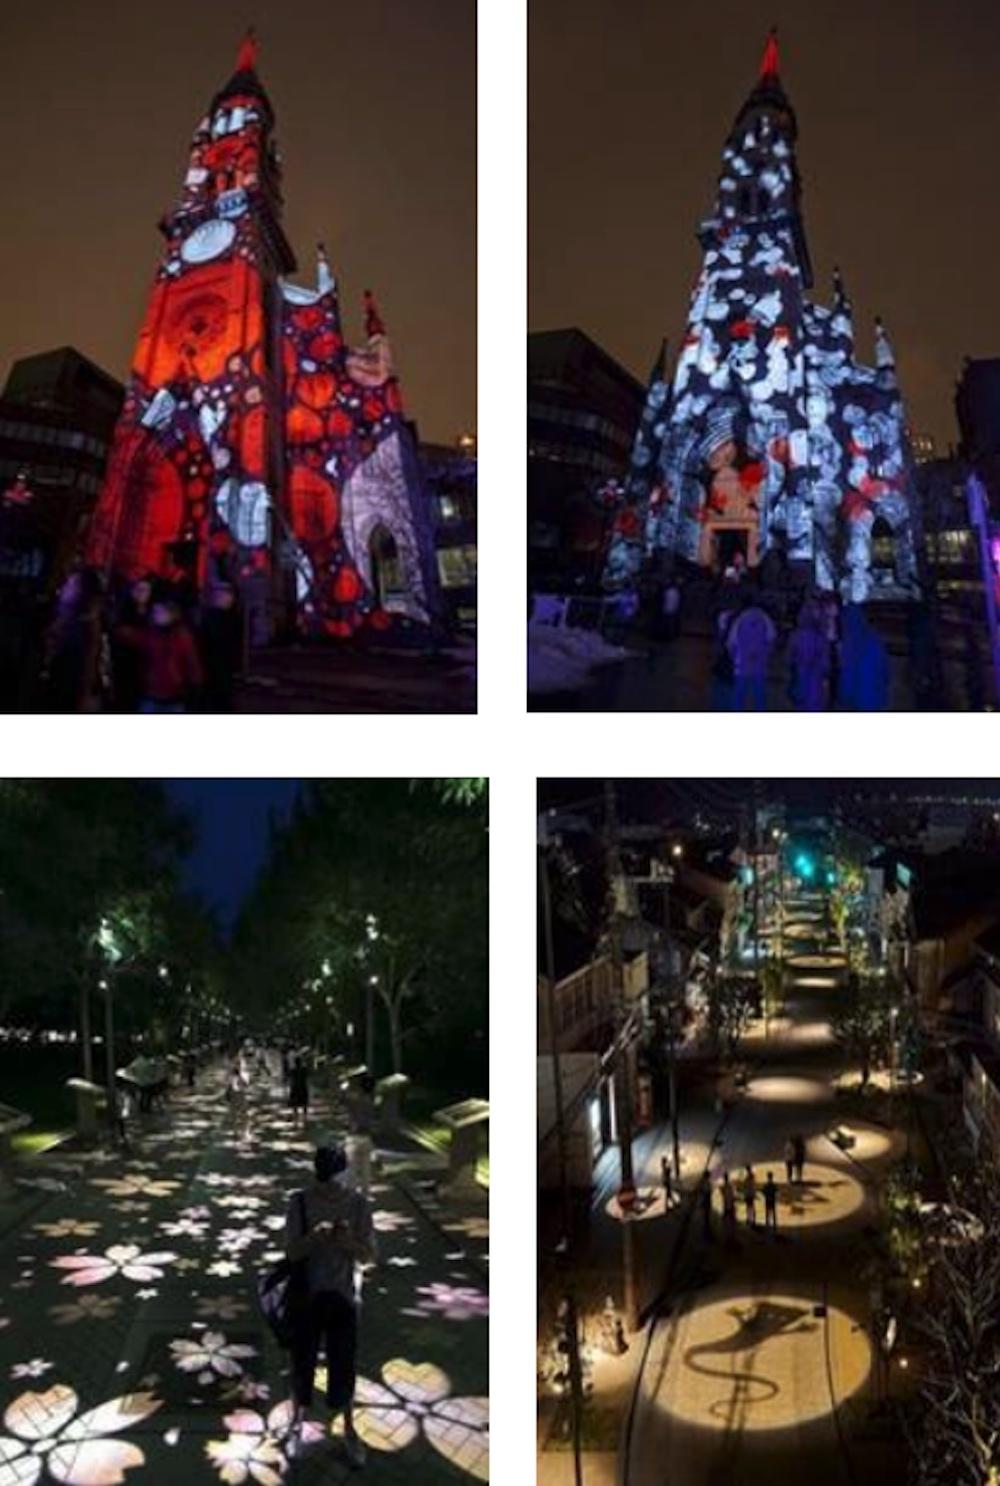 nighttime lighting installation projection